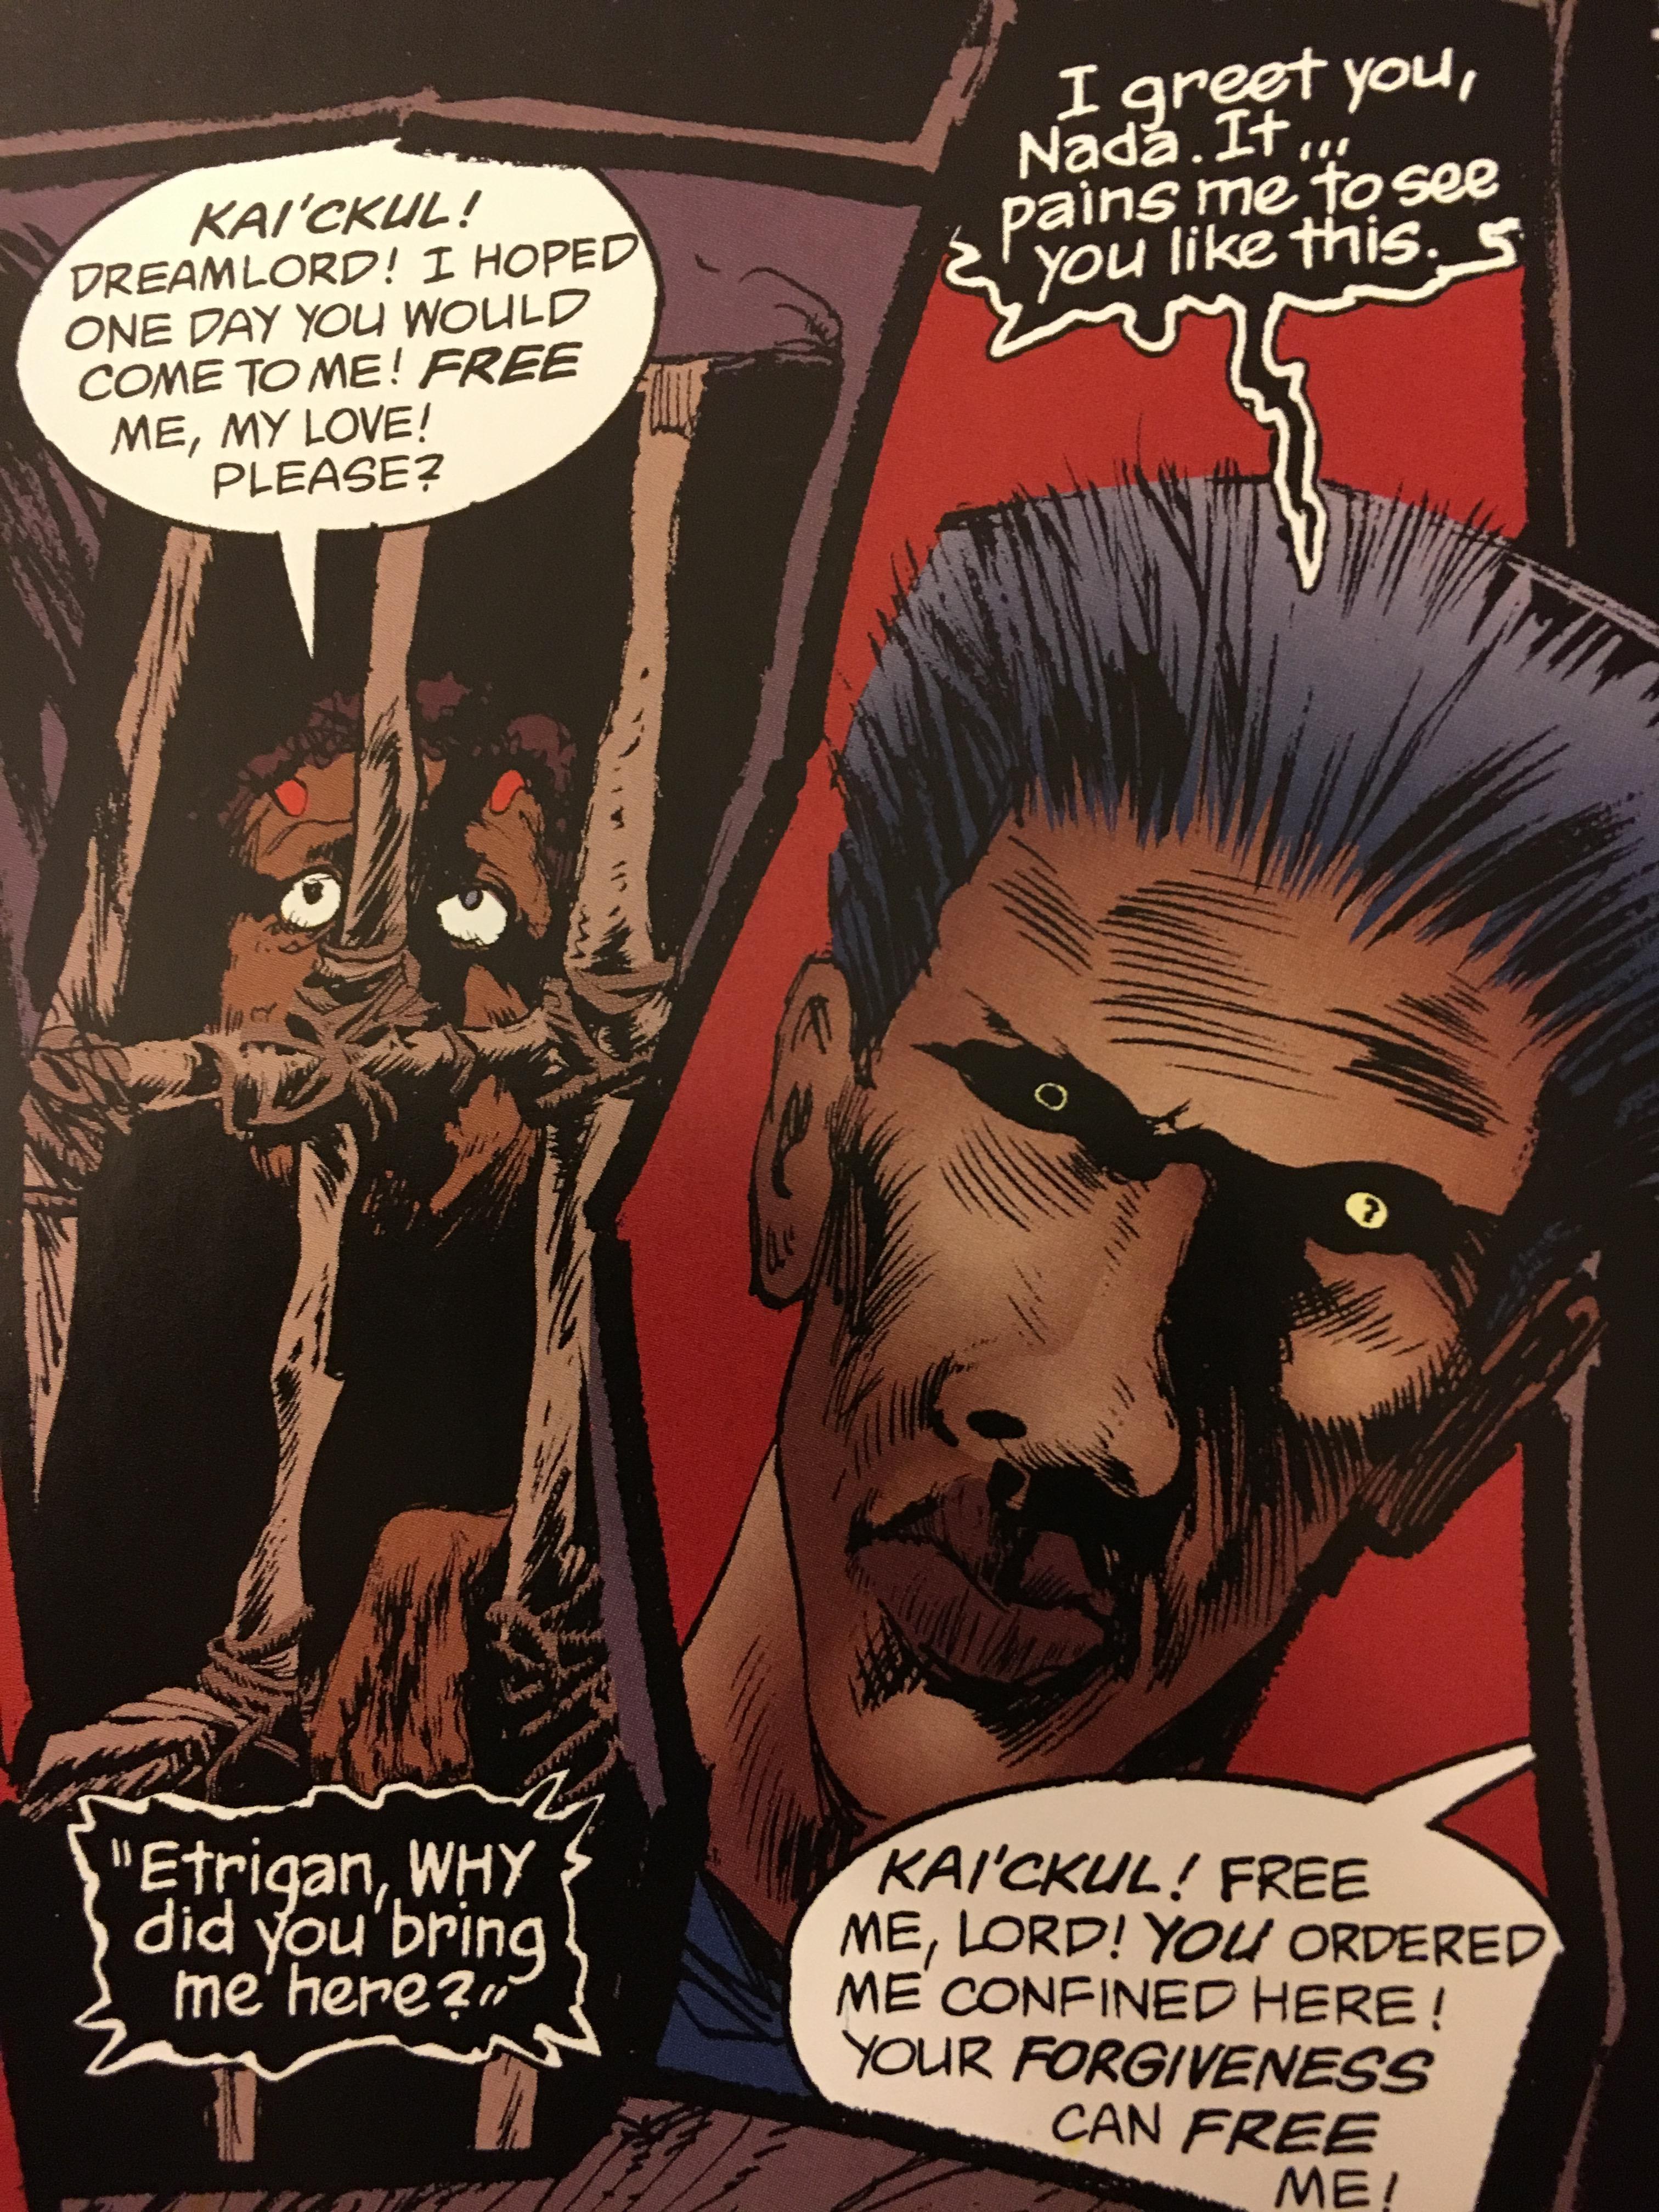 Searching Sandman – Issue 4 part 2. | Kechal Comics